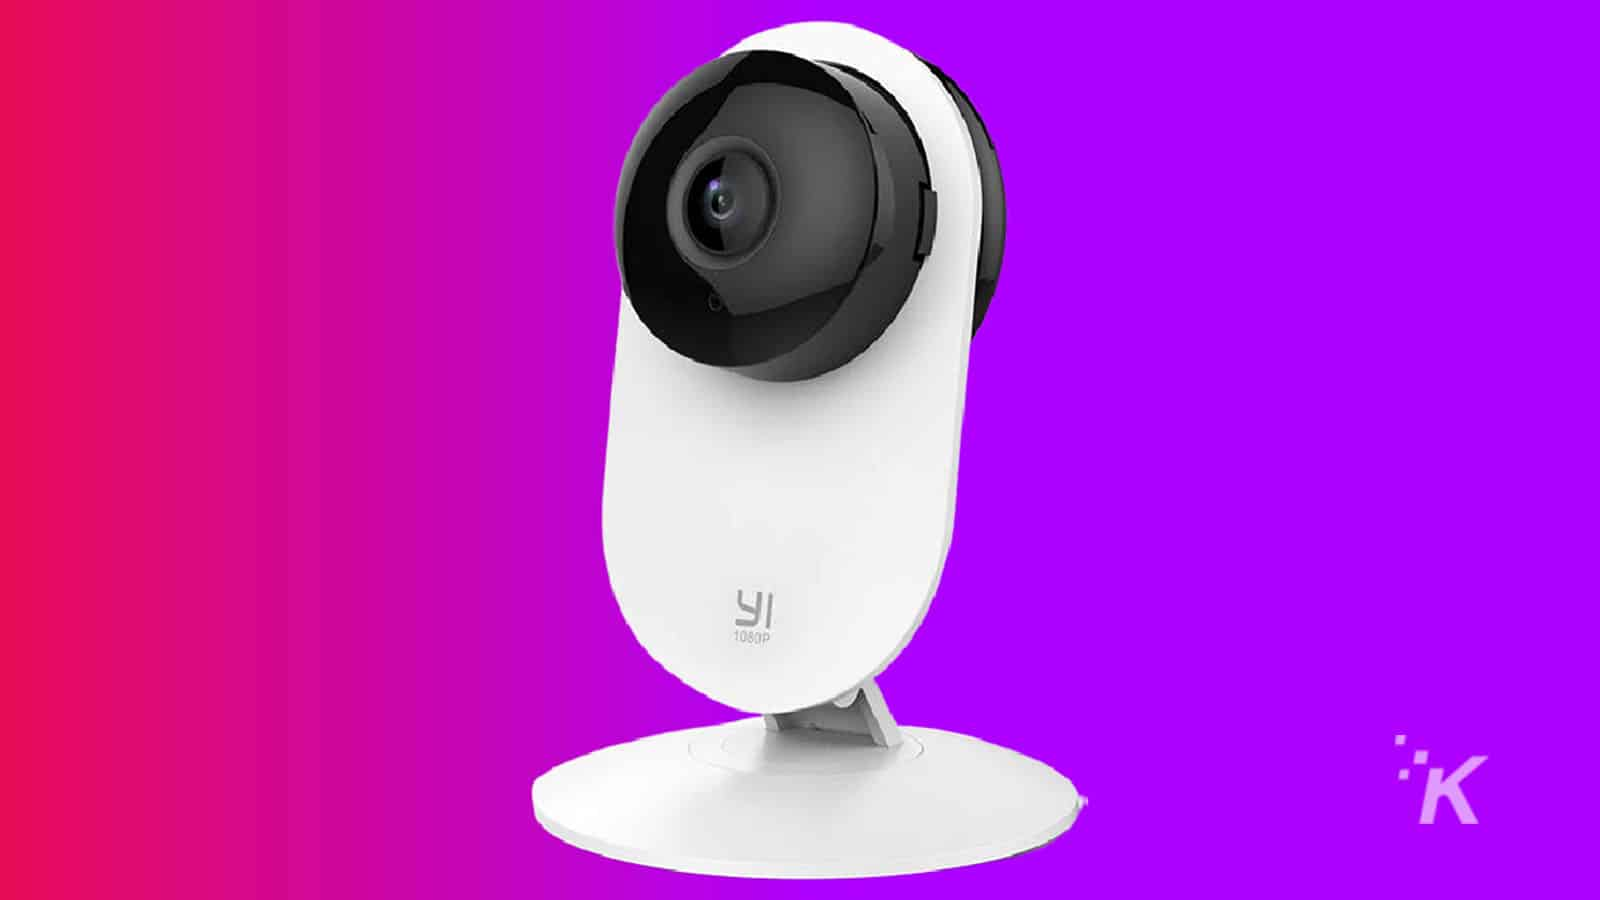 yi security cam knowtechie deals